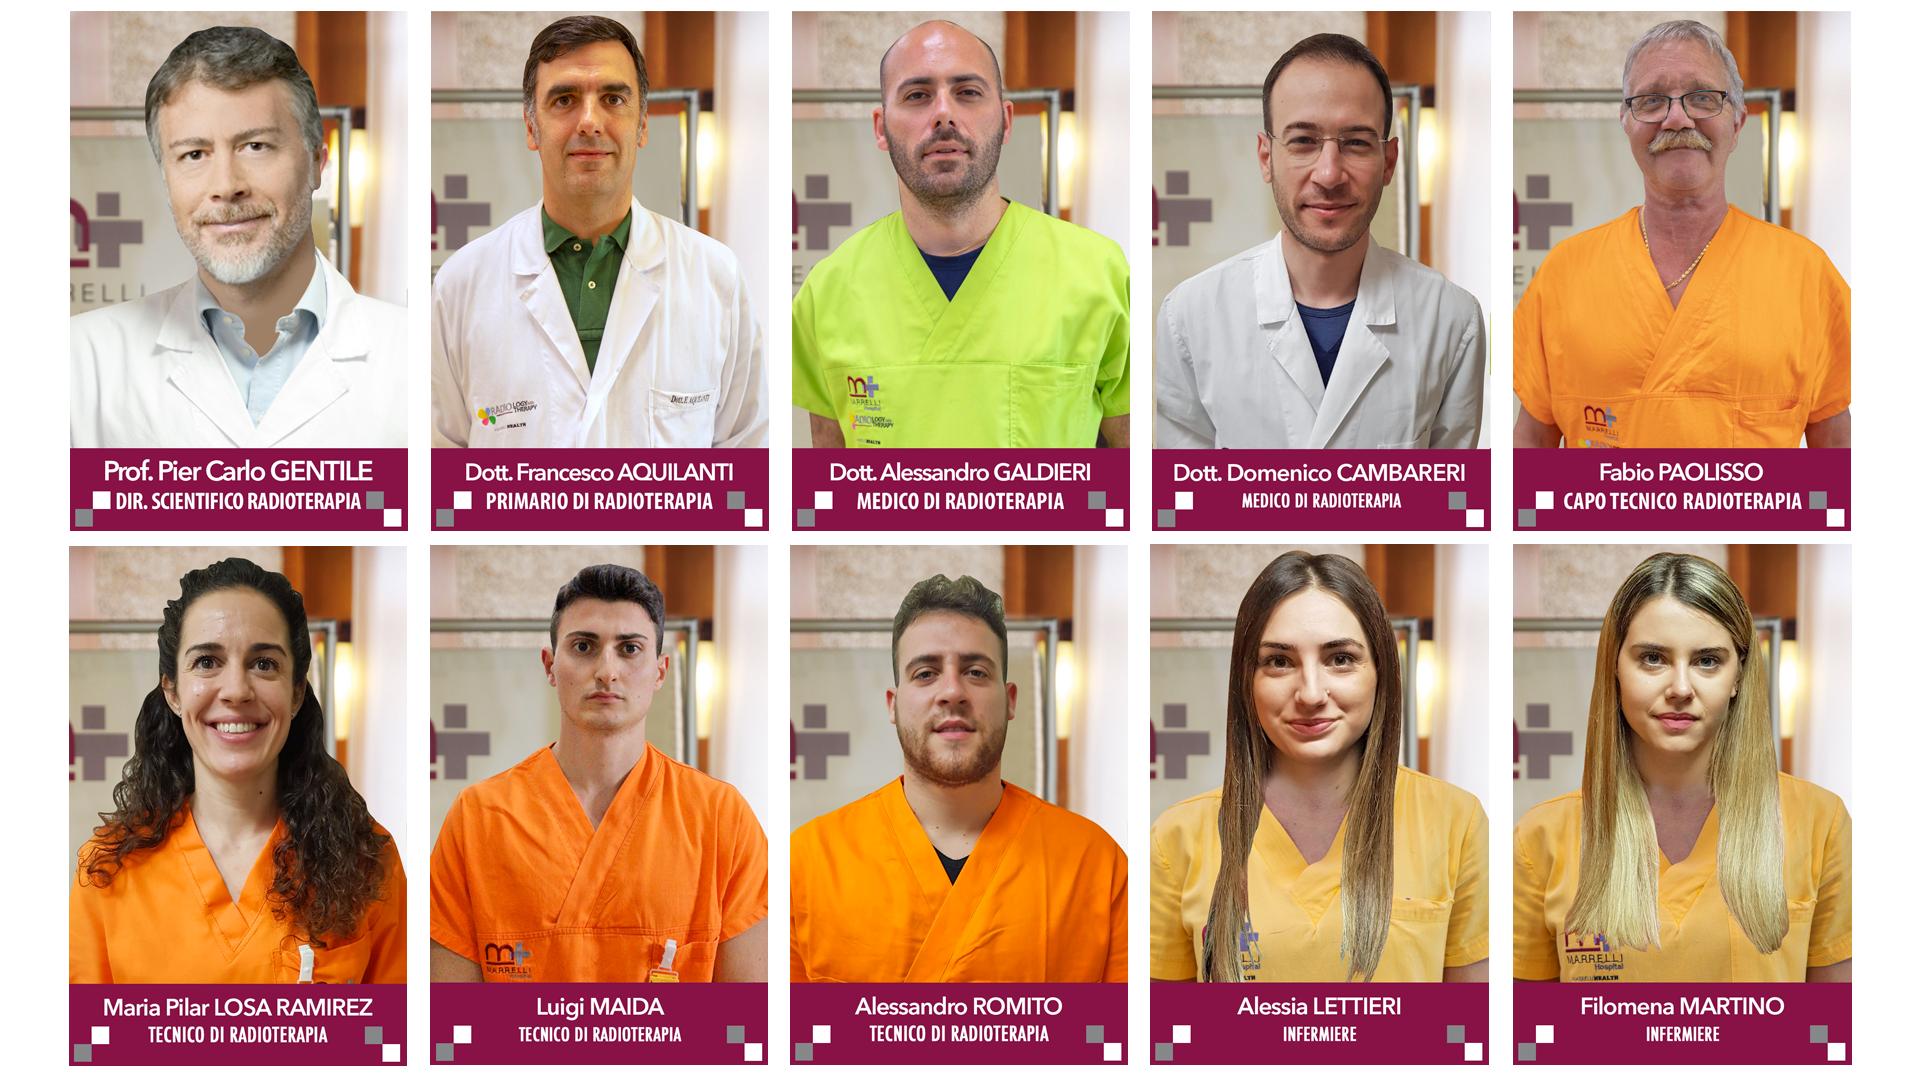 Marrelli Hospital - Health Care Center in Crotone - Italy